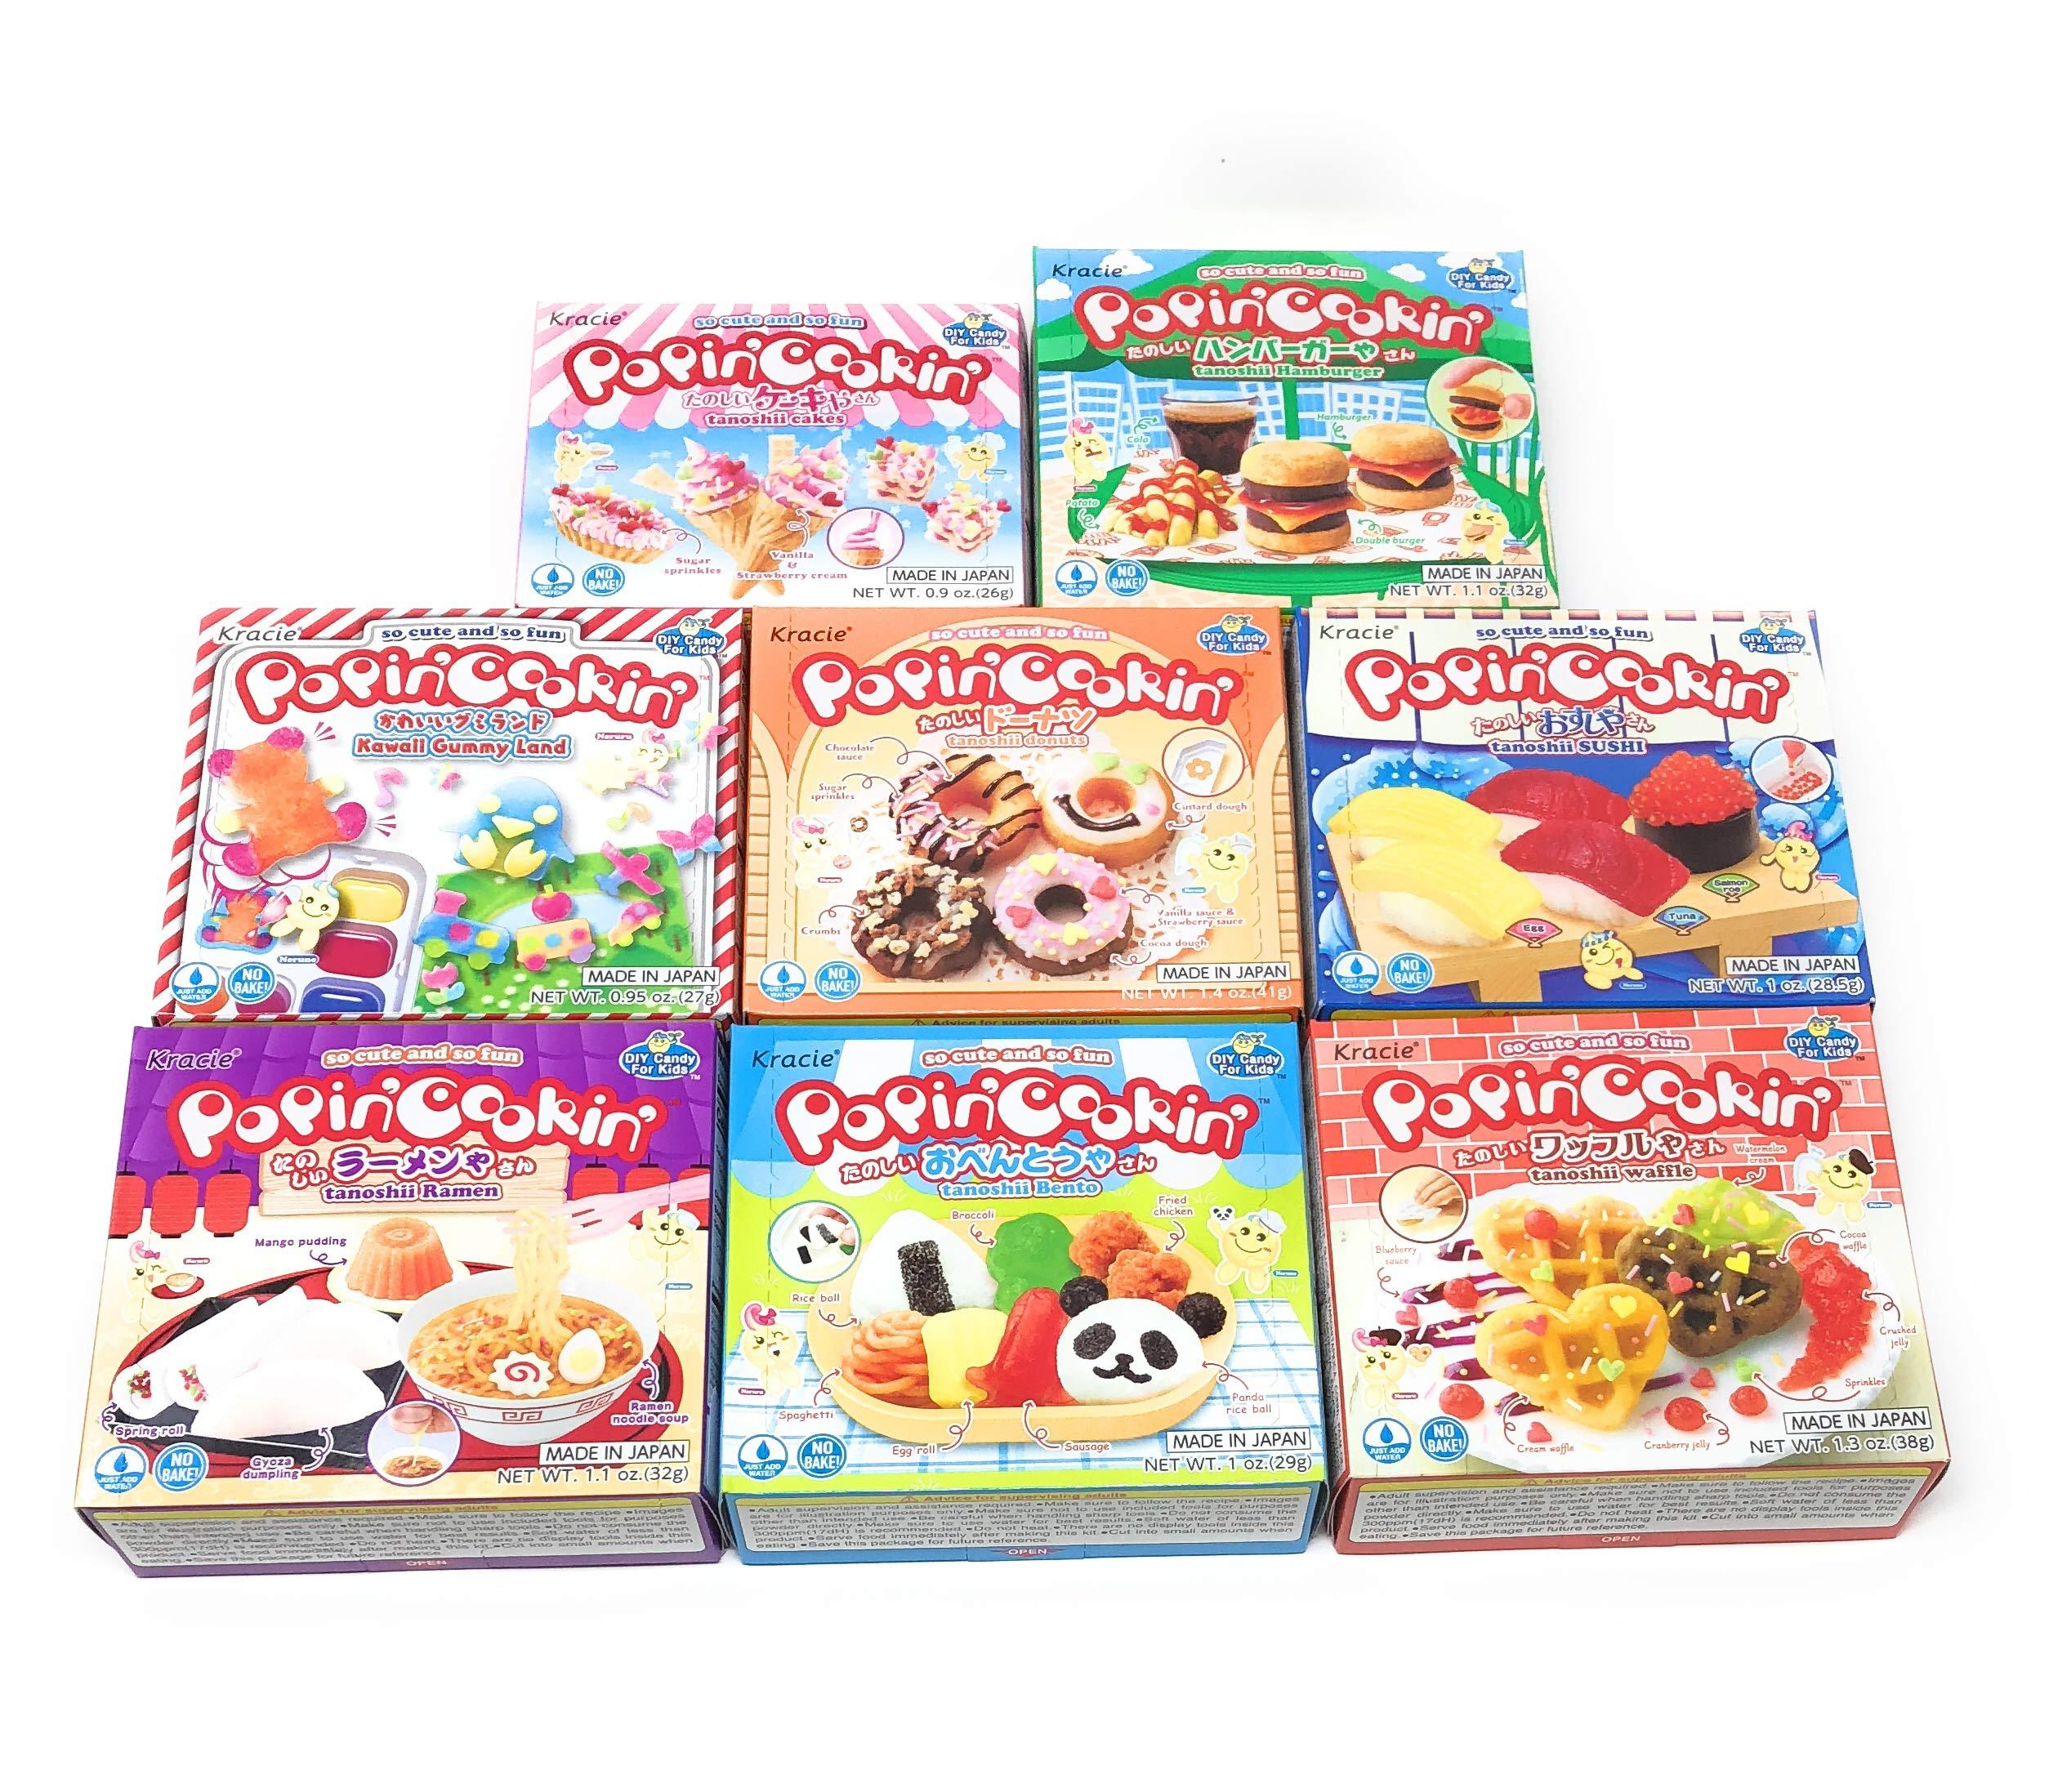 Popin' Cookin Diy Candy Kit (8 Pack Varieties) - Tanoshii Bento, Ramen and Waffle, Cakes, Sushi and Donuts, Hamburger, and Kawaii Gummy Land in Fusion Select Gift Box by Fusion Select